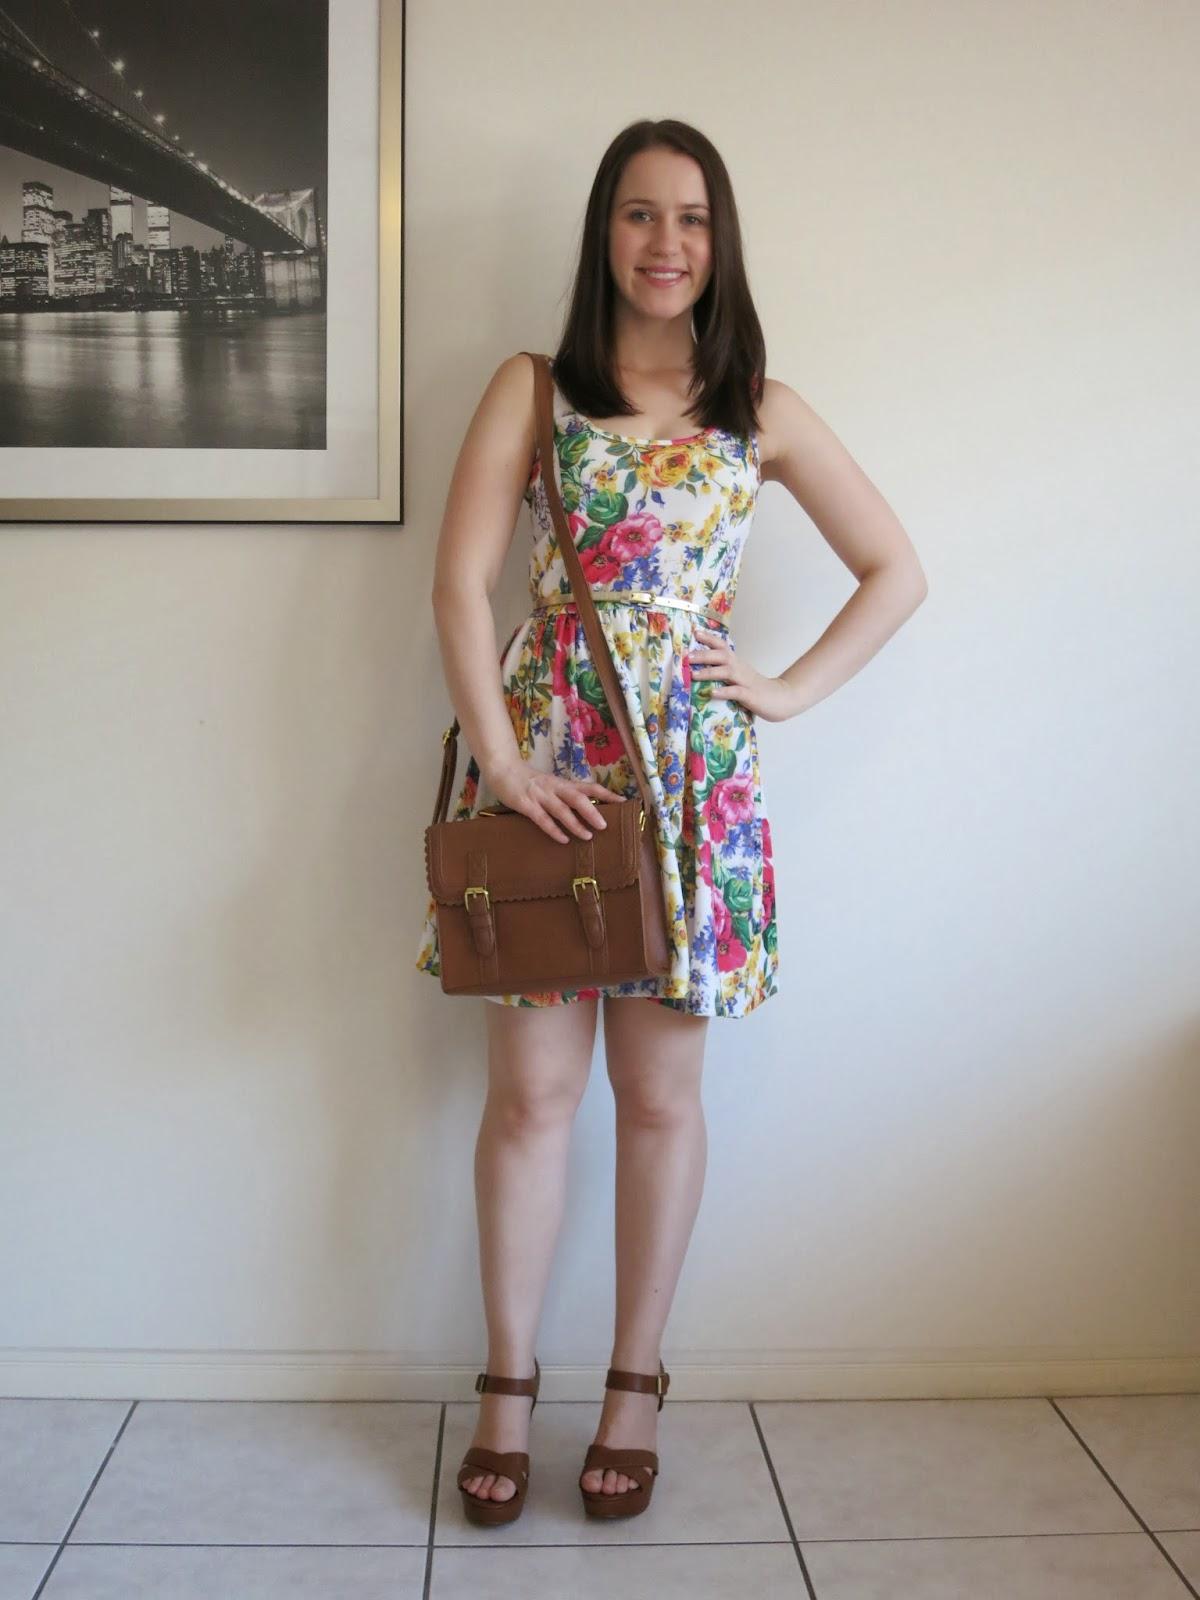 petite outfit, petite girl outfit, zara floral dress, tan accessories, ASOS bag, tan wedges